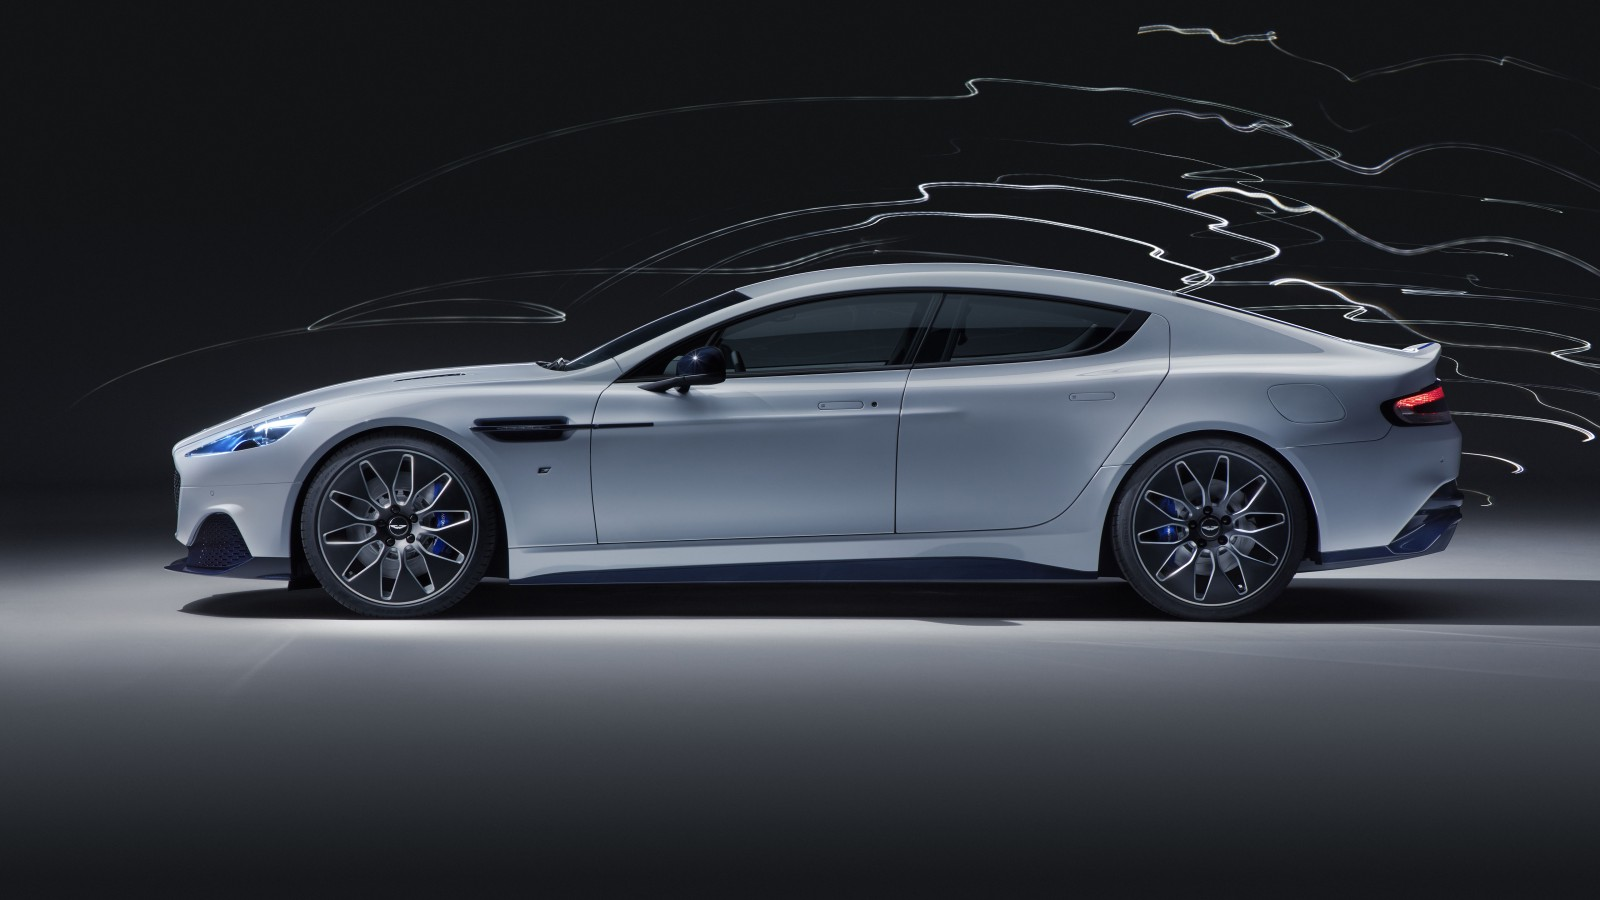 Aston Martin Rapide E 2019 5k 3 Wallpaper Hd Car